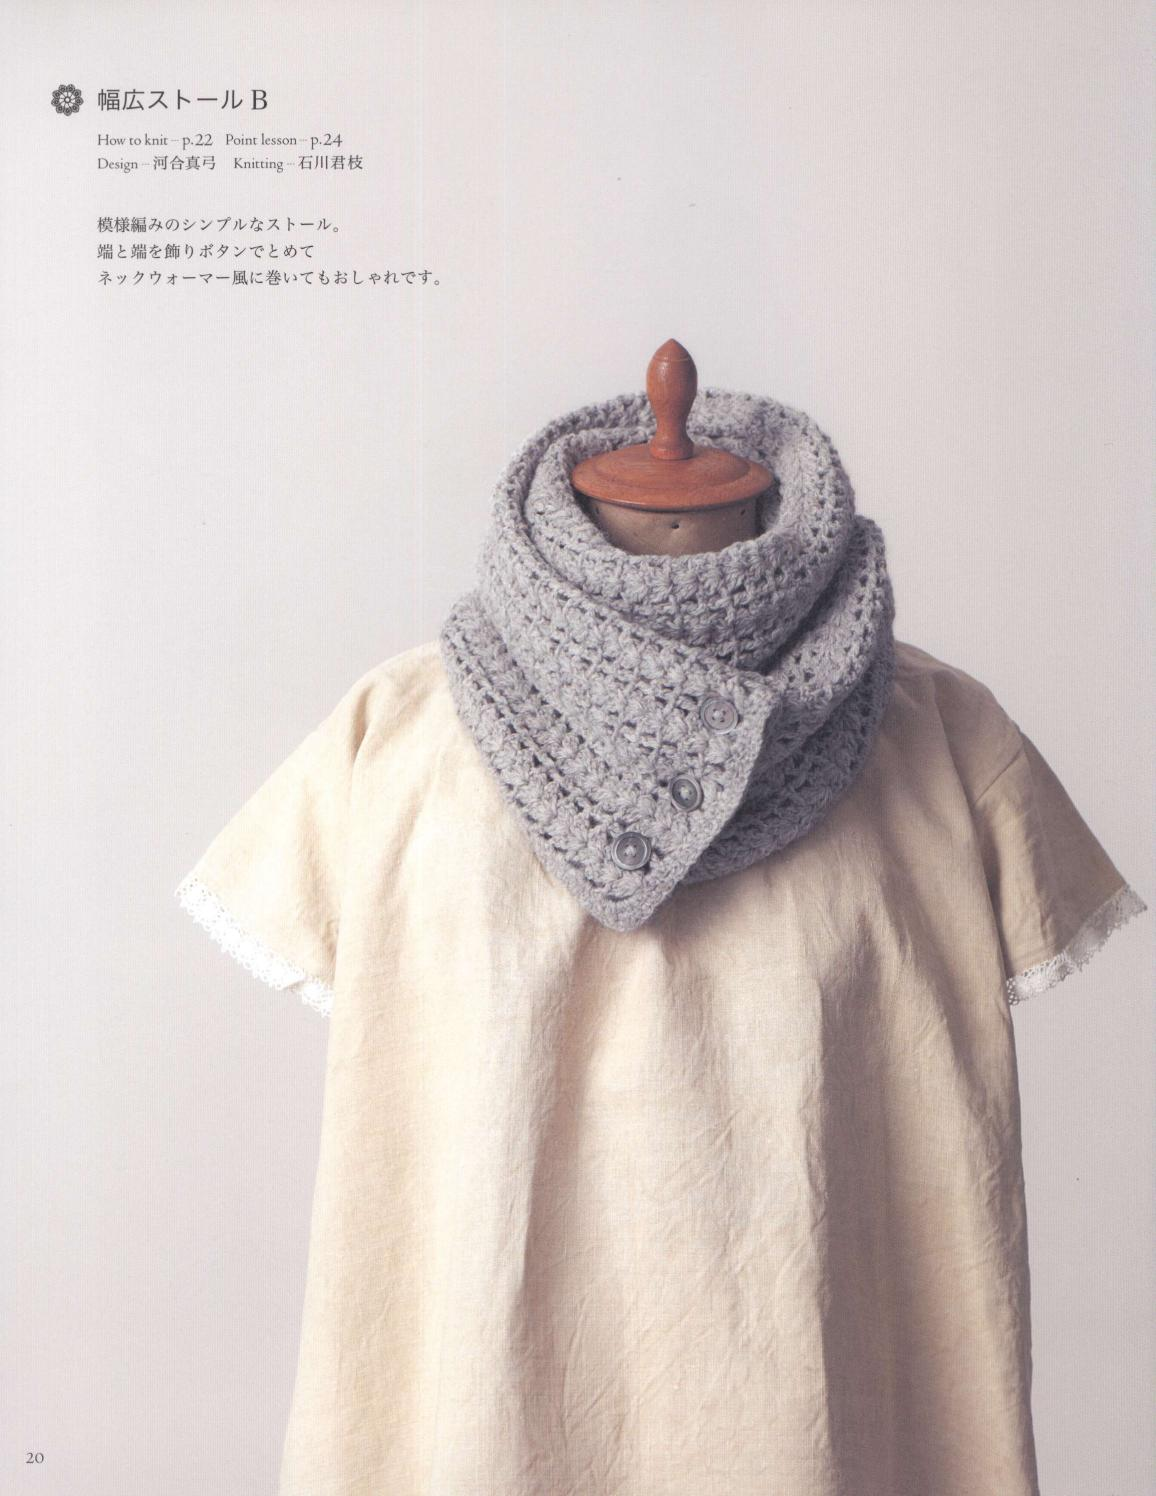 Asahi original crochet best selection 2012 page 20